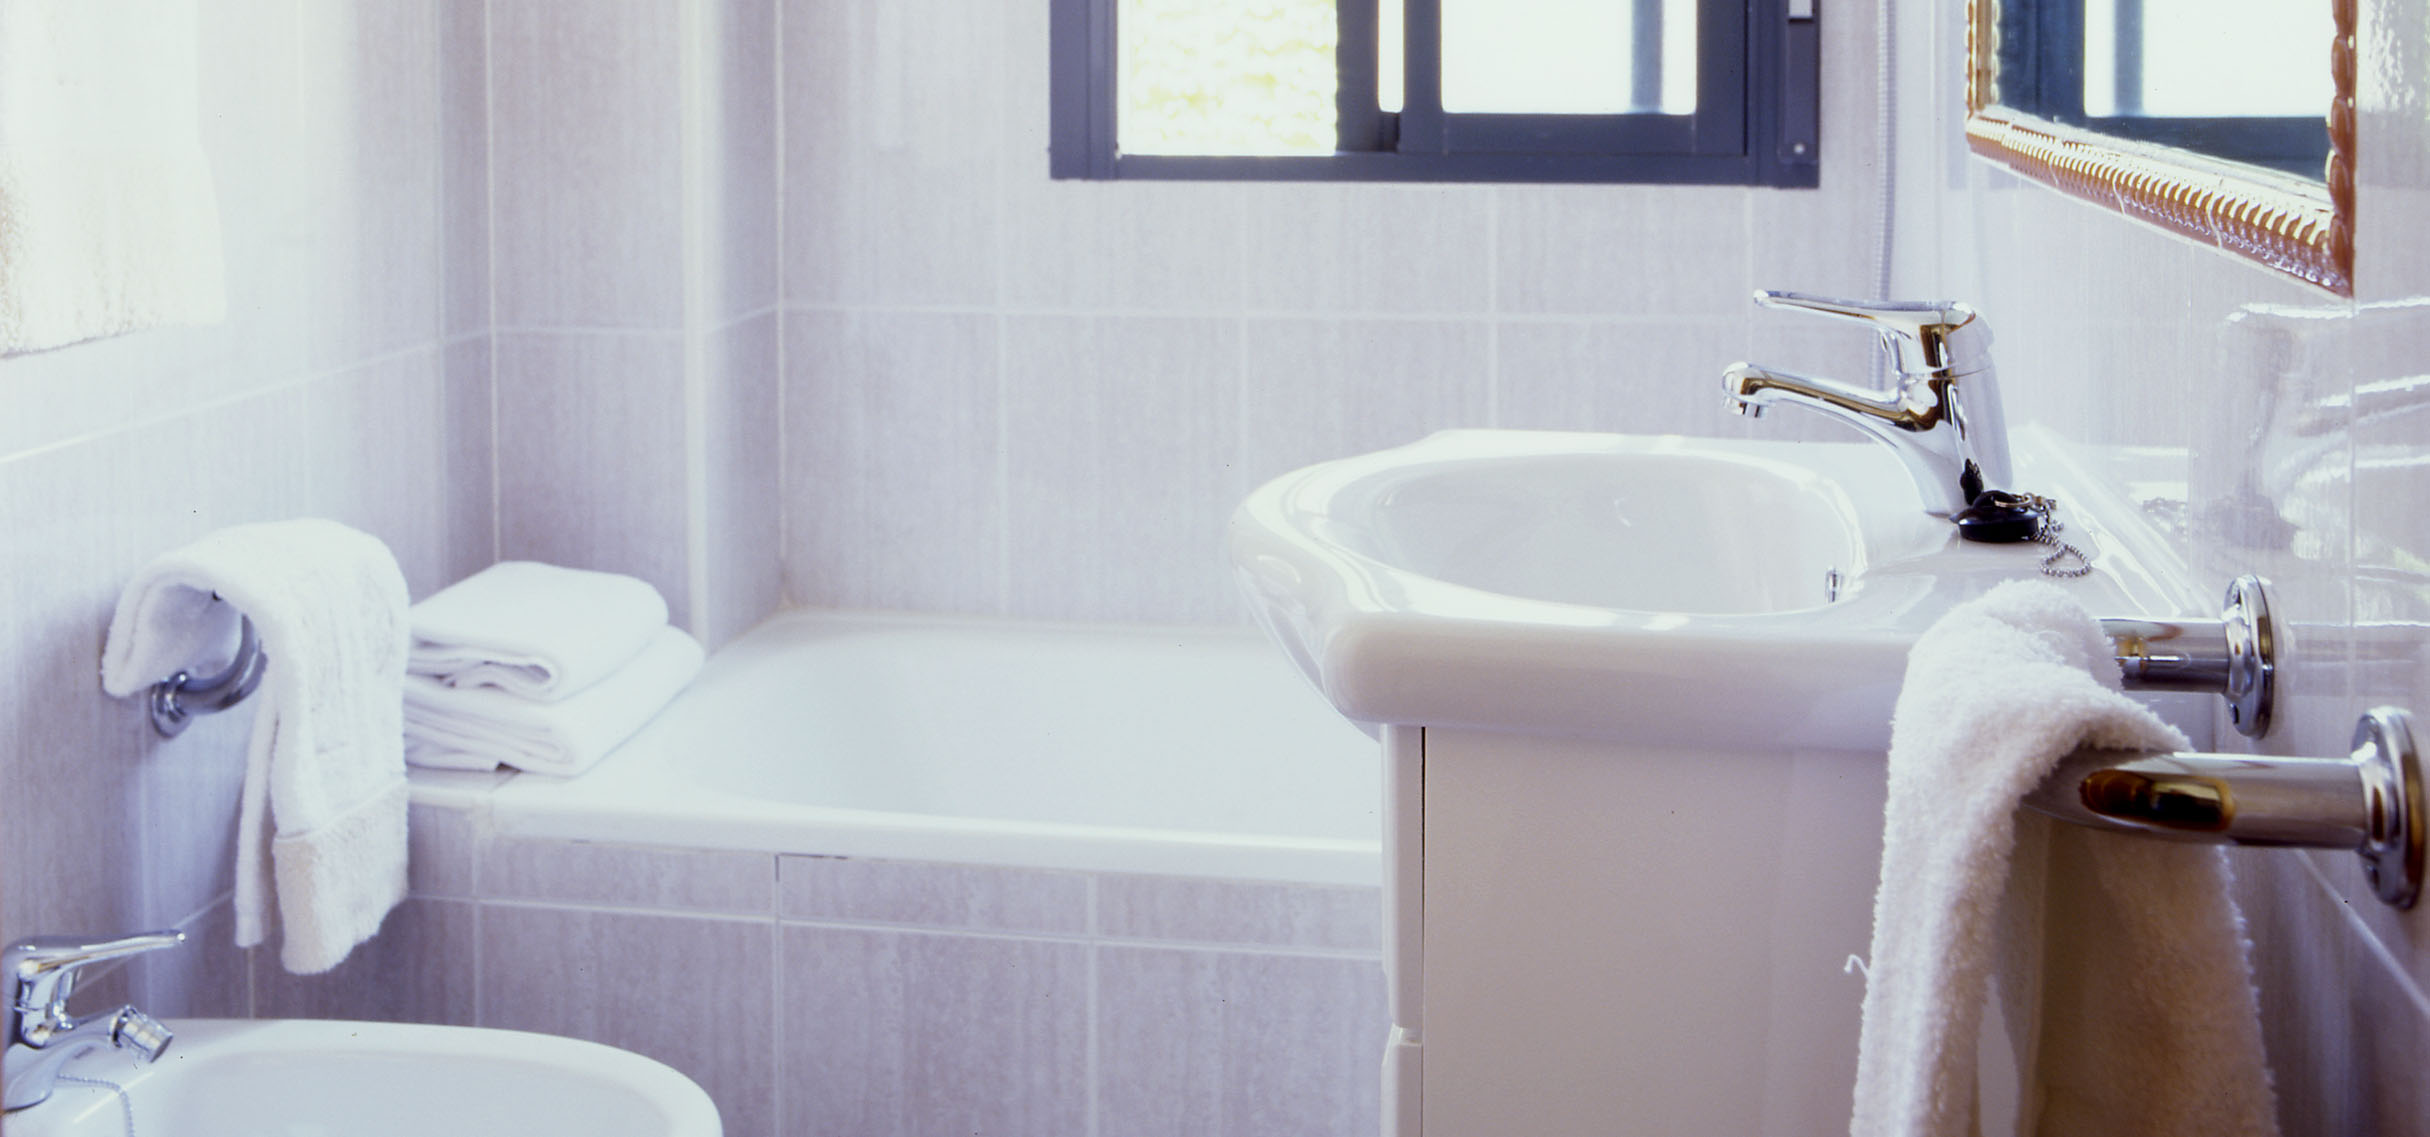 Alquilar apartamentos en madrid por meses semanas for Alquiler pisos vacios madrid